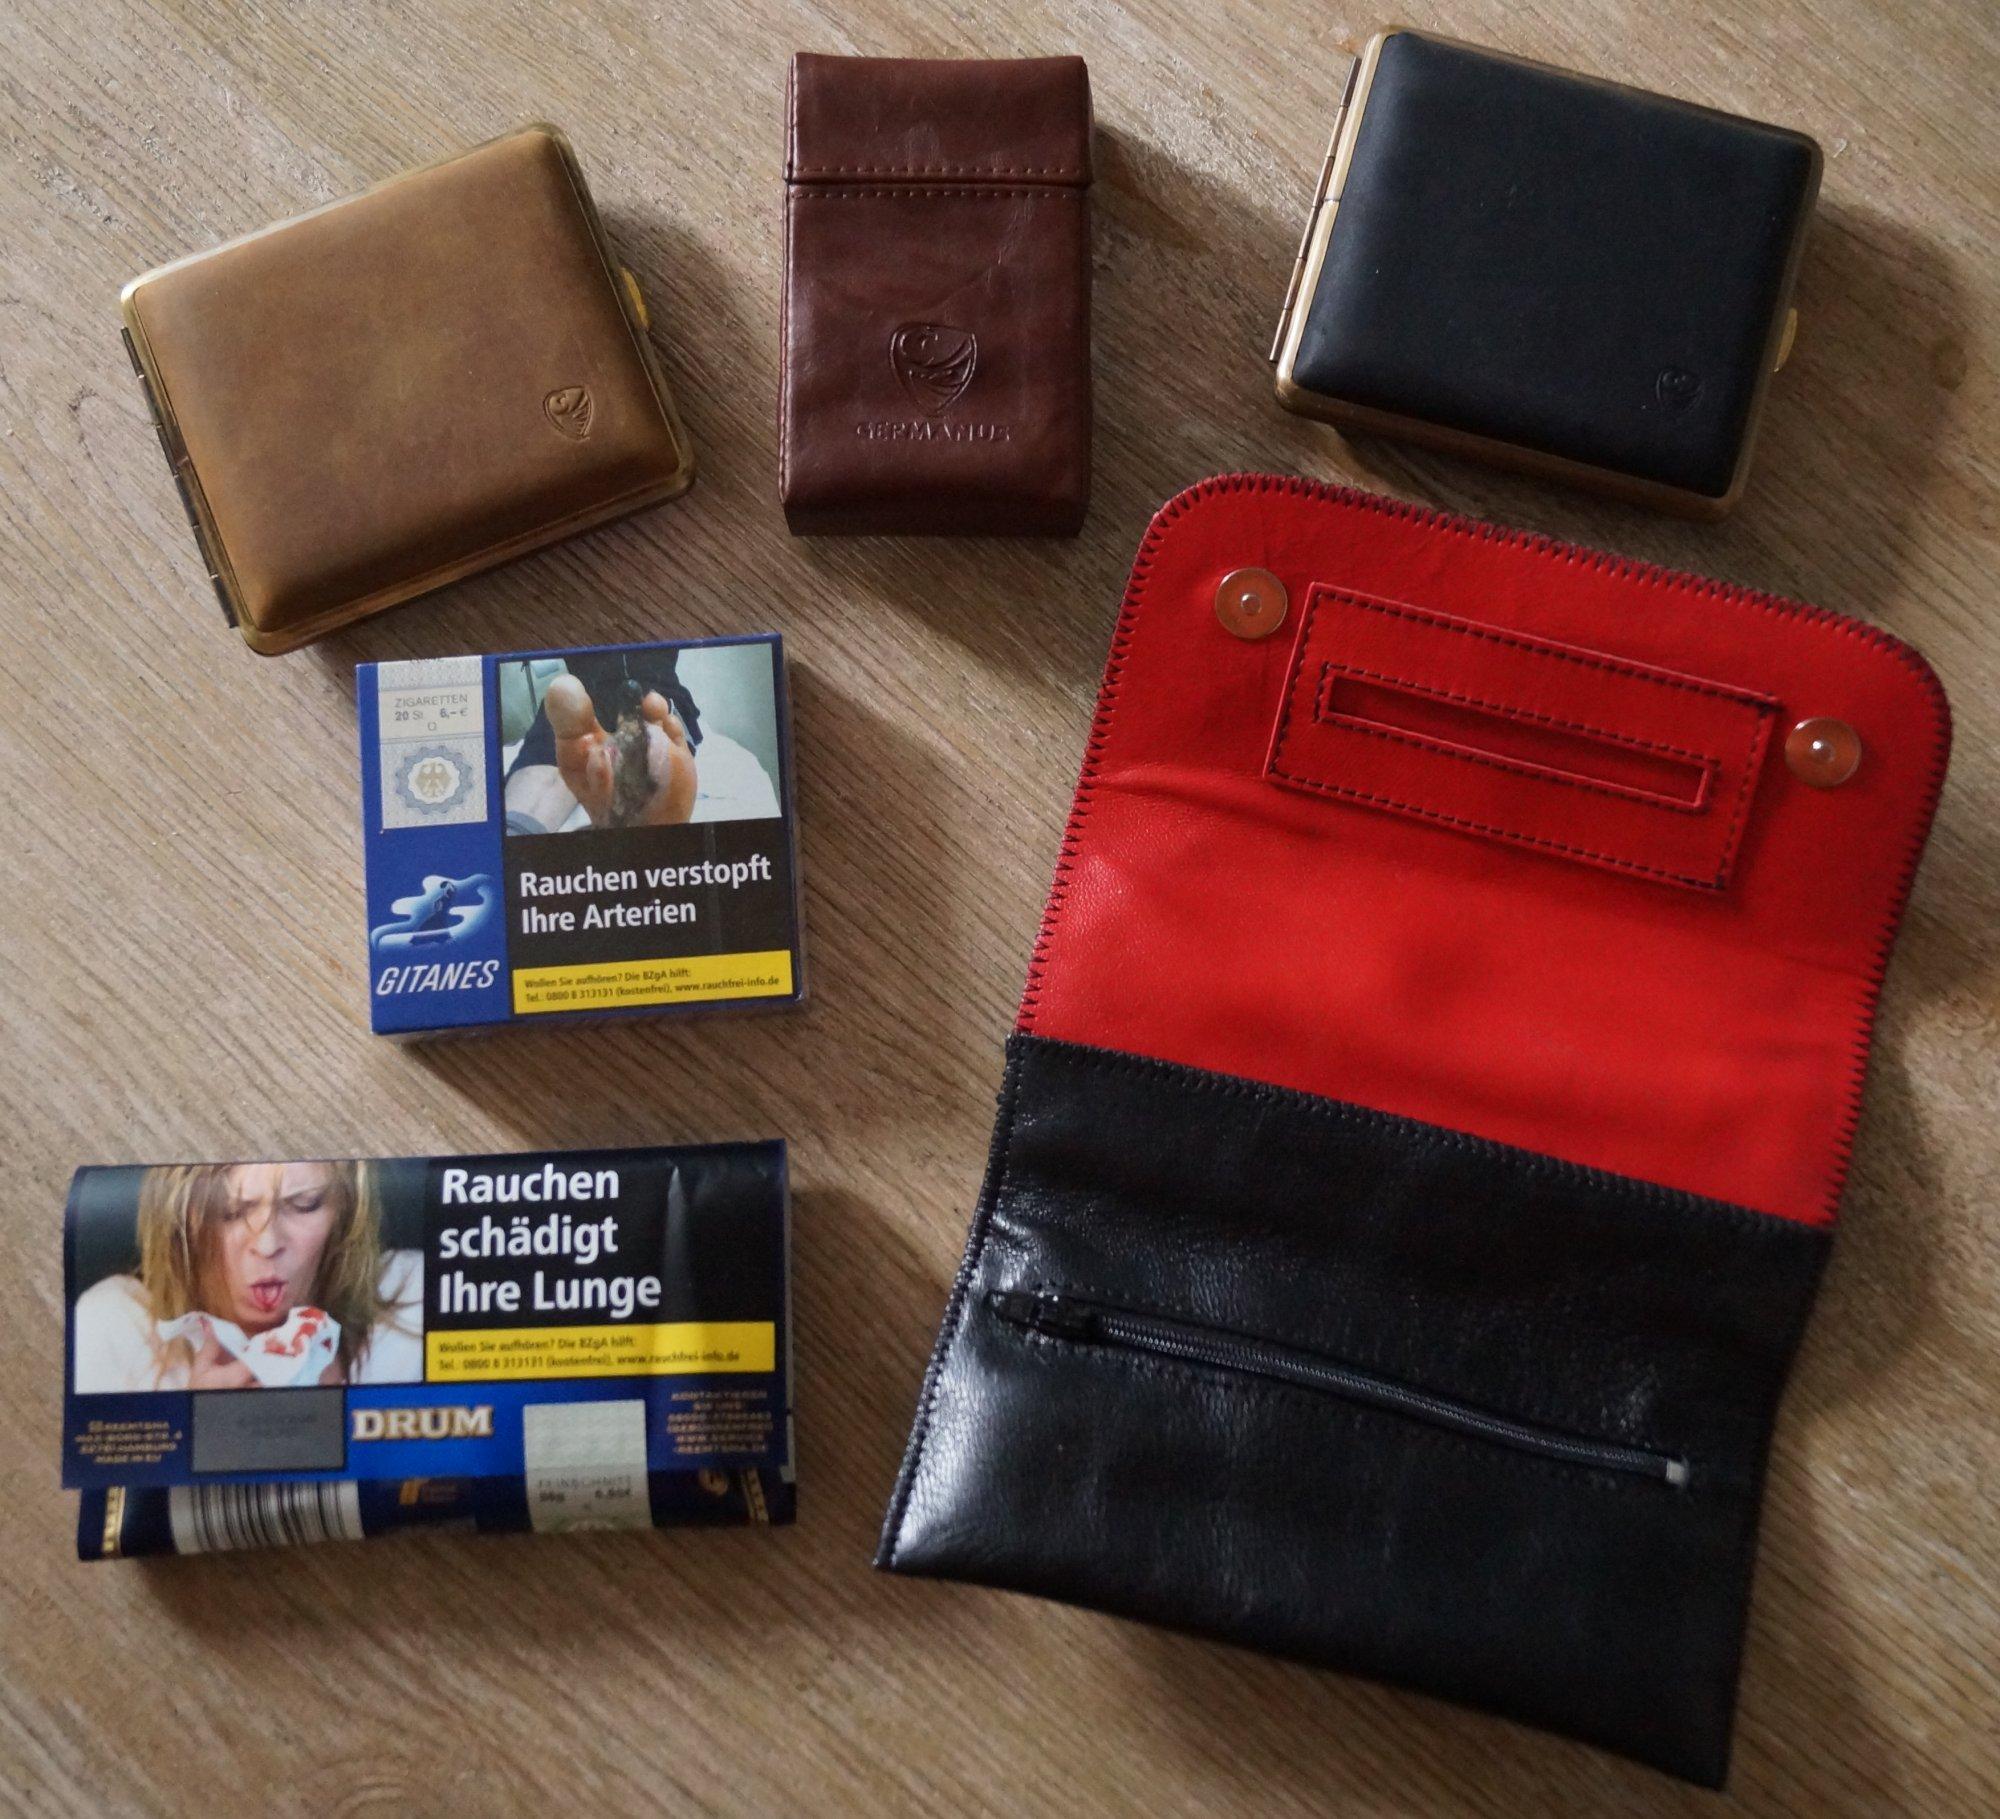 zigarettenetui zigarettencase tabaktasche schockbilder schockphotos